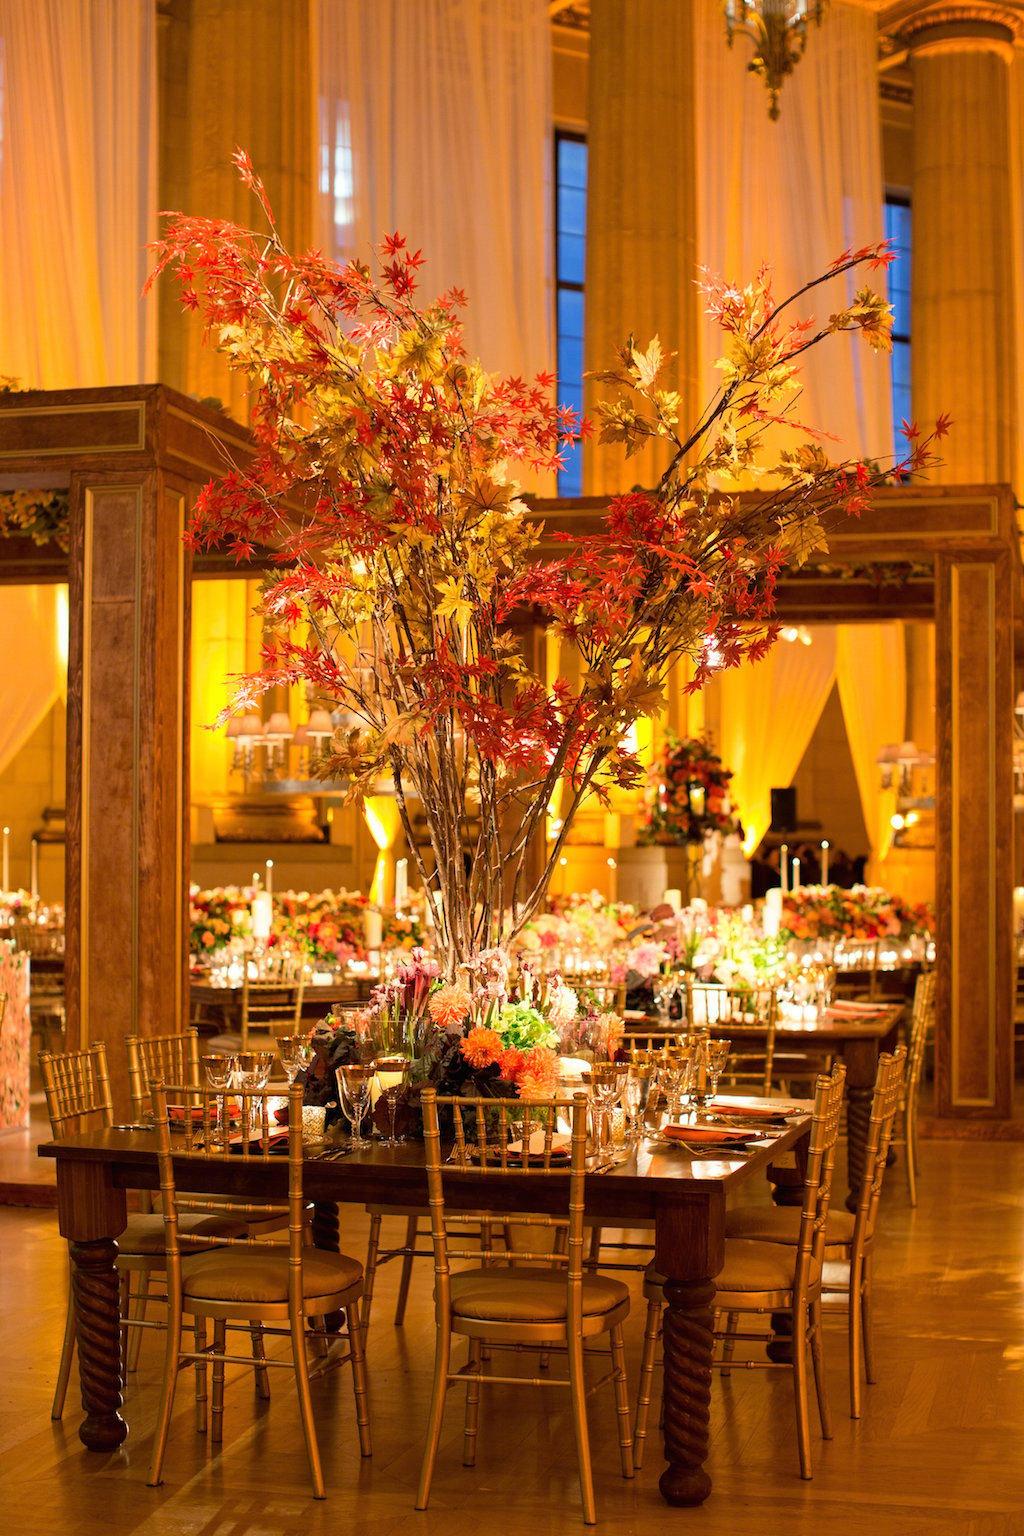 9-26-16-fall-foliage-wedding-andrew-mellon-auditorium-new